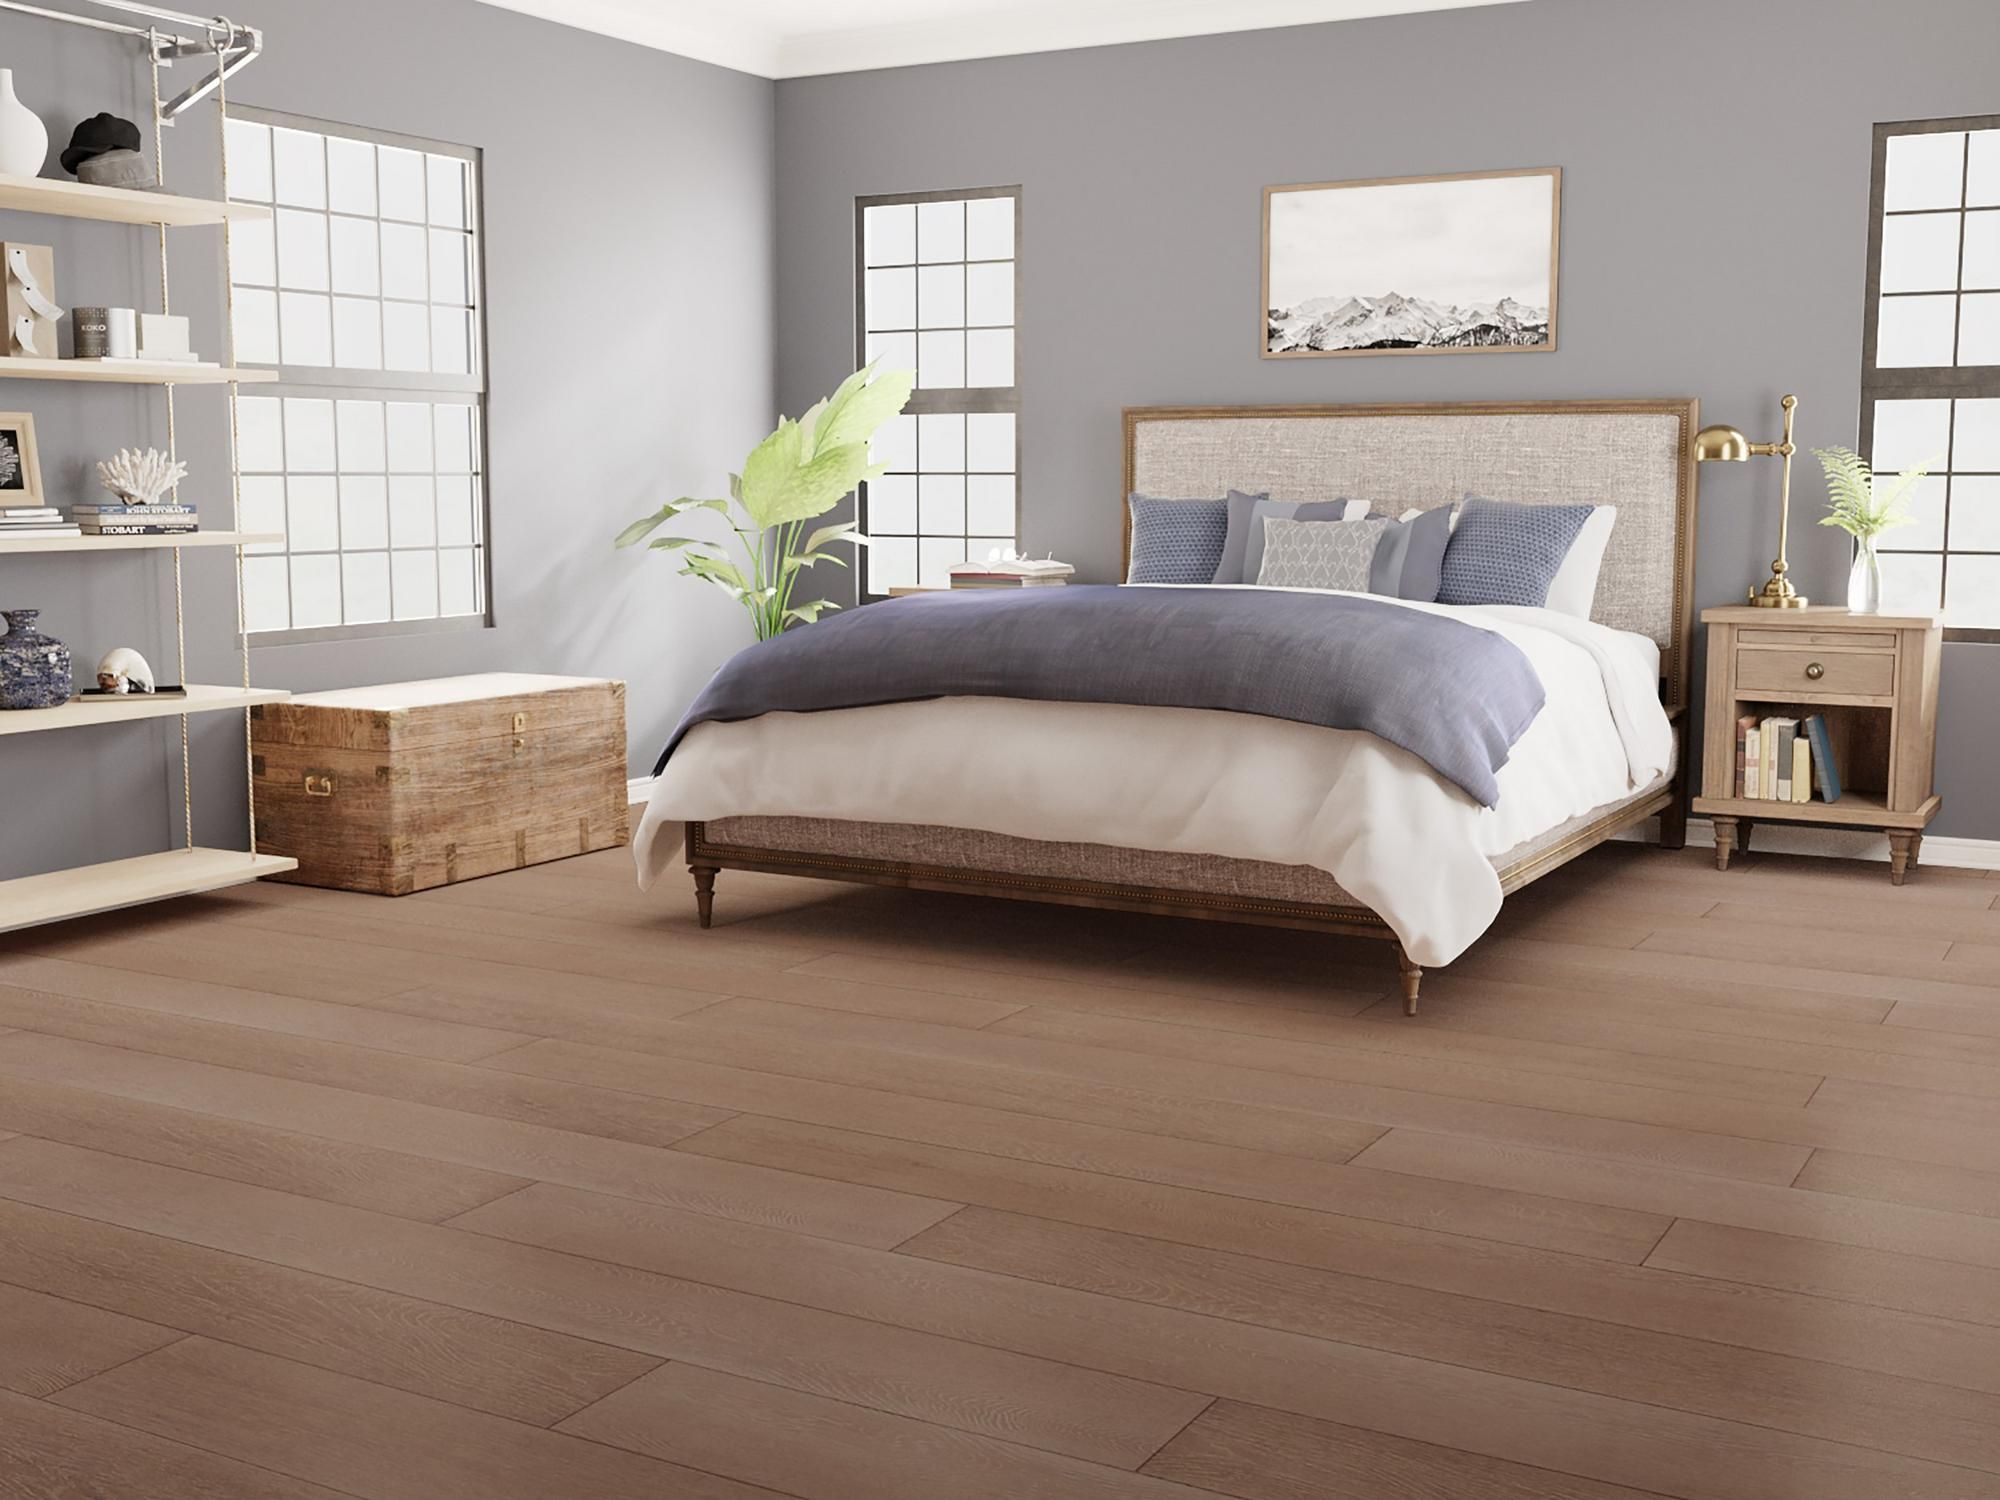 Eco Forest Latte Oak Solid Stranded Bamboo | Floor & Decor | Floor Decor, Bedroom Interior, Living Room Remodel